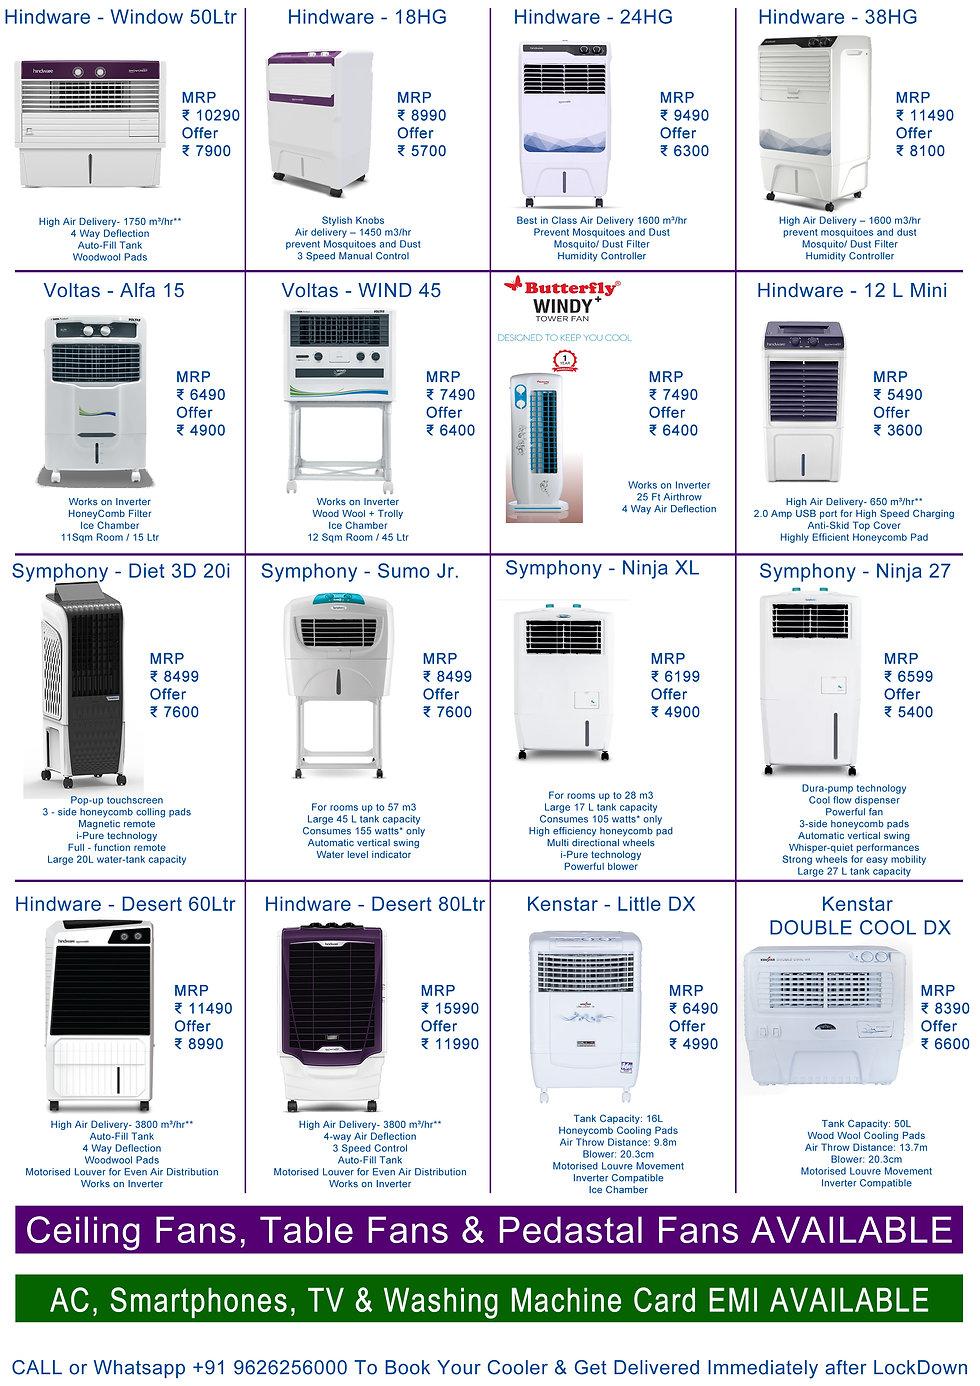 Air Cooler V2 copy.jpg